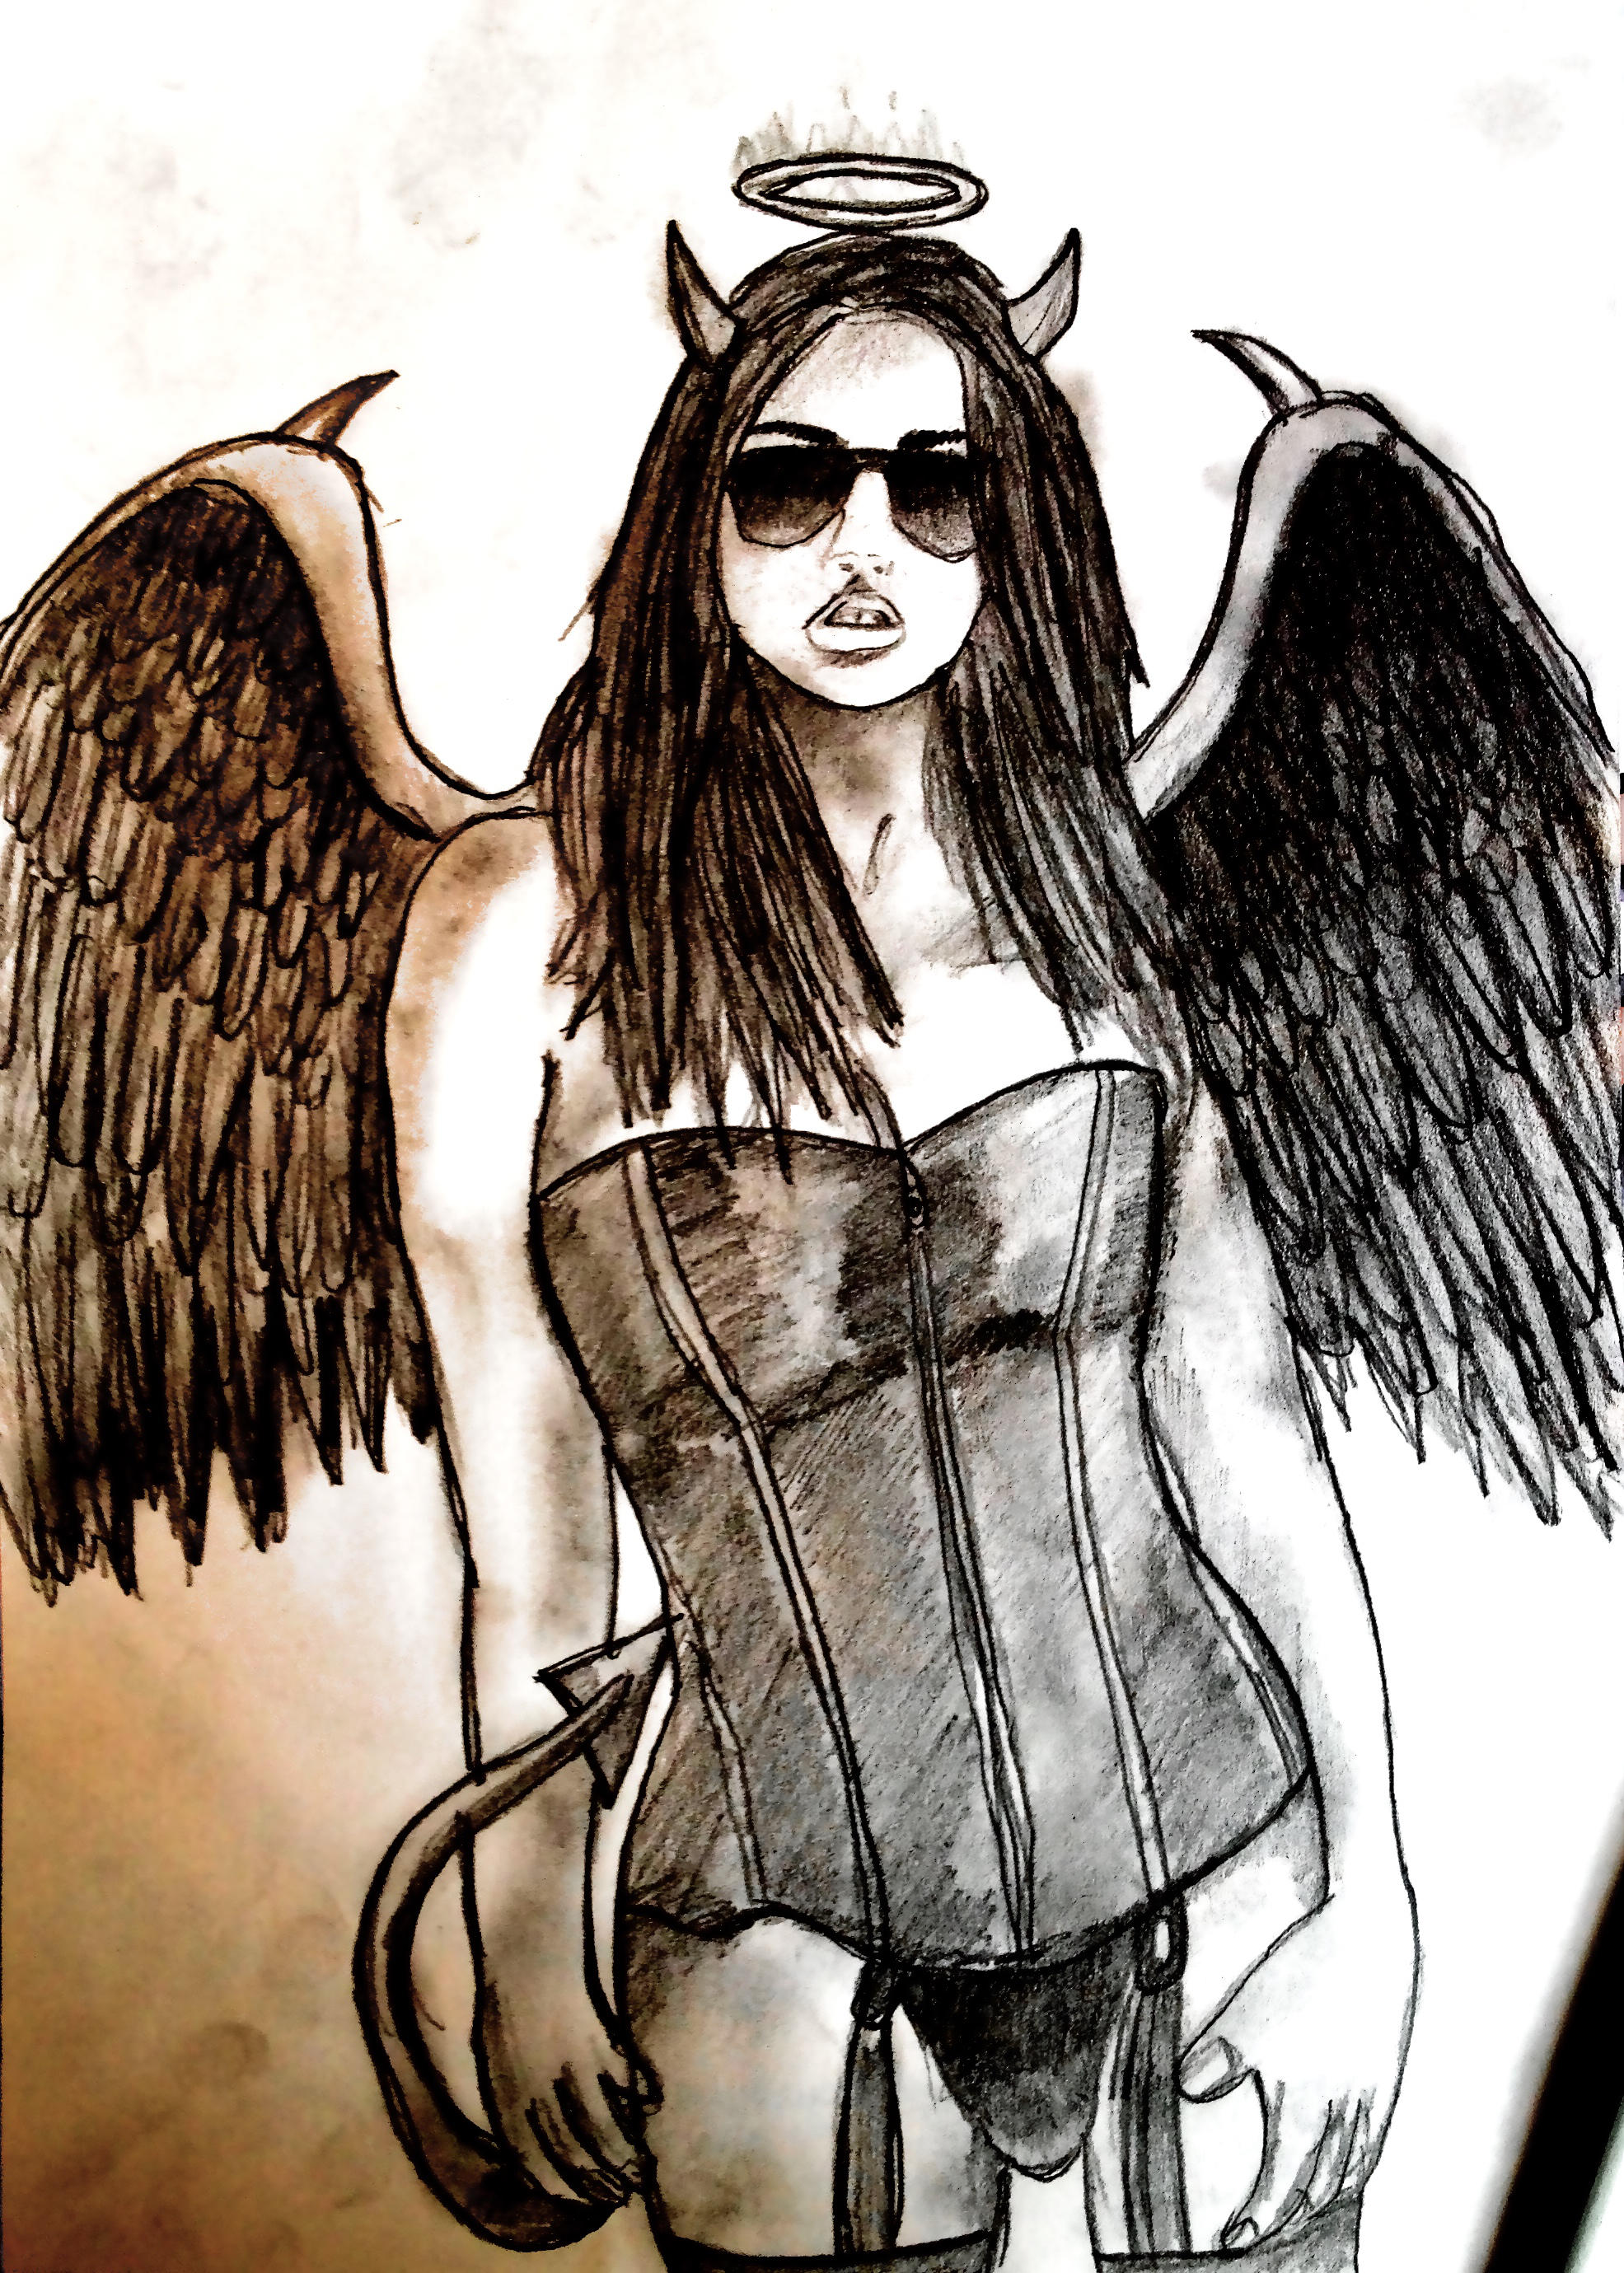 AngelDevil Girl by Stijn B by StijnBes